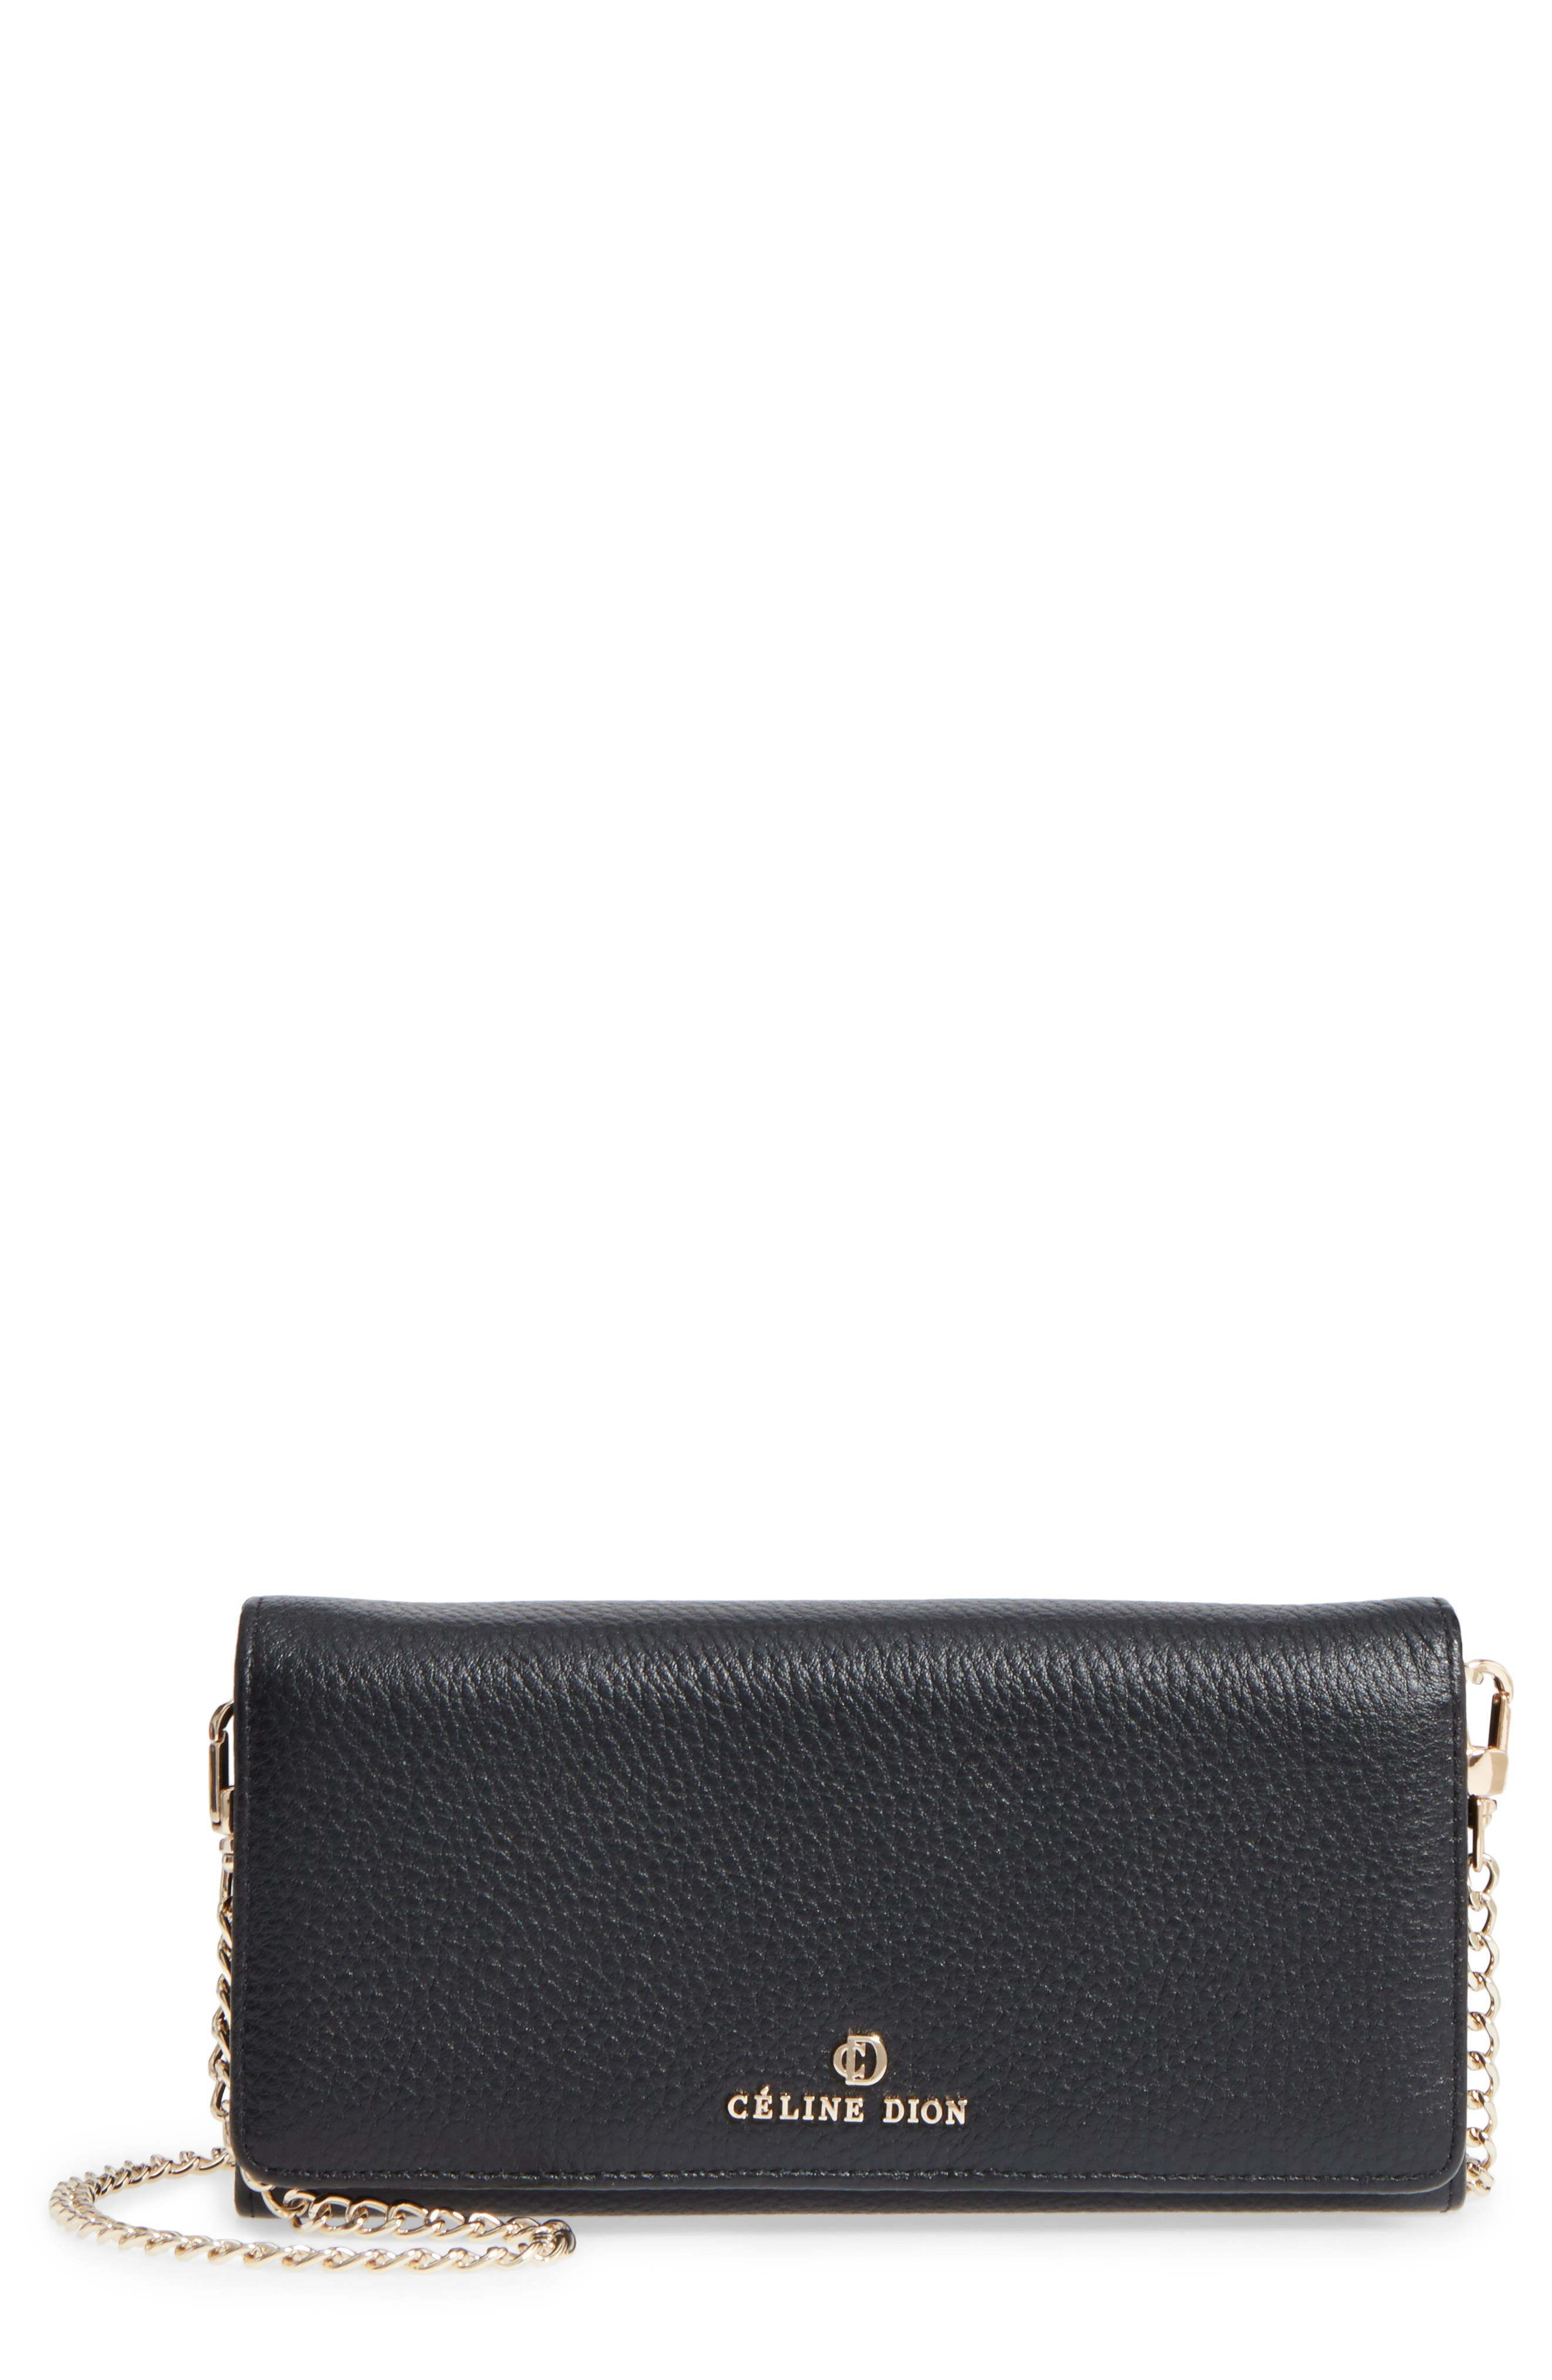 Céline Dion Adagio Leather Crossbody Wallet,                         Main,                         color, 001